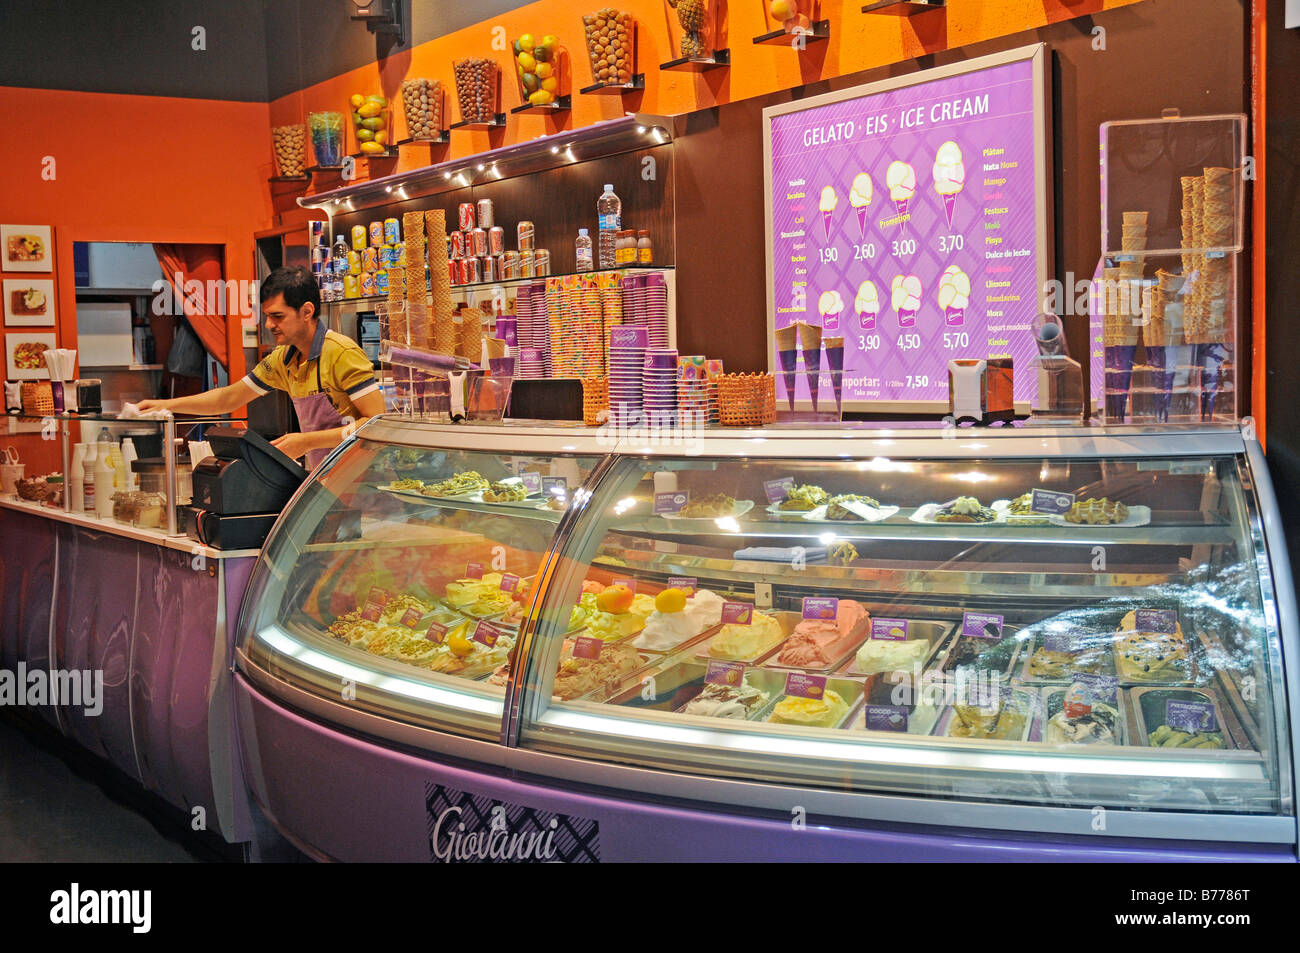 Ice-cream parlour, La Ribera quarter, Barcelona, Catalonia, Spain, Europe - Stock Image